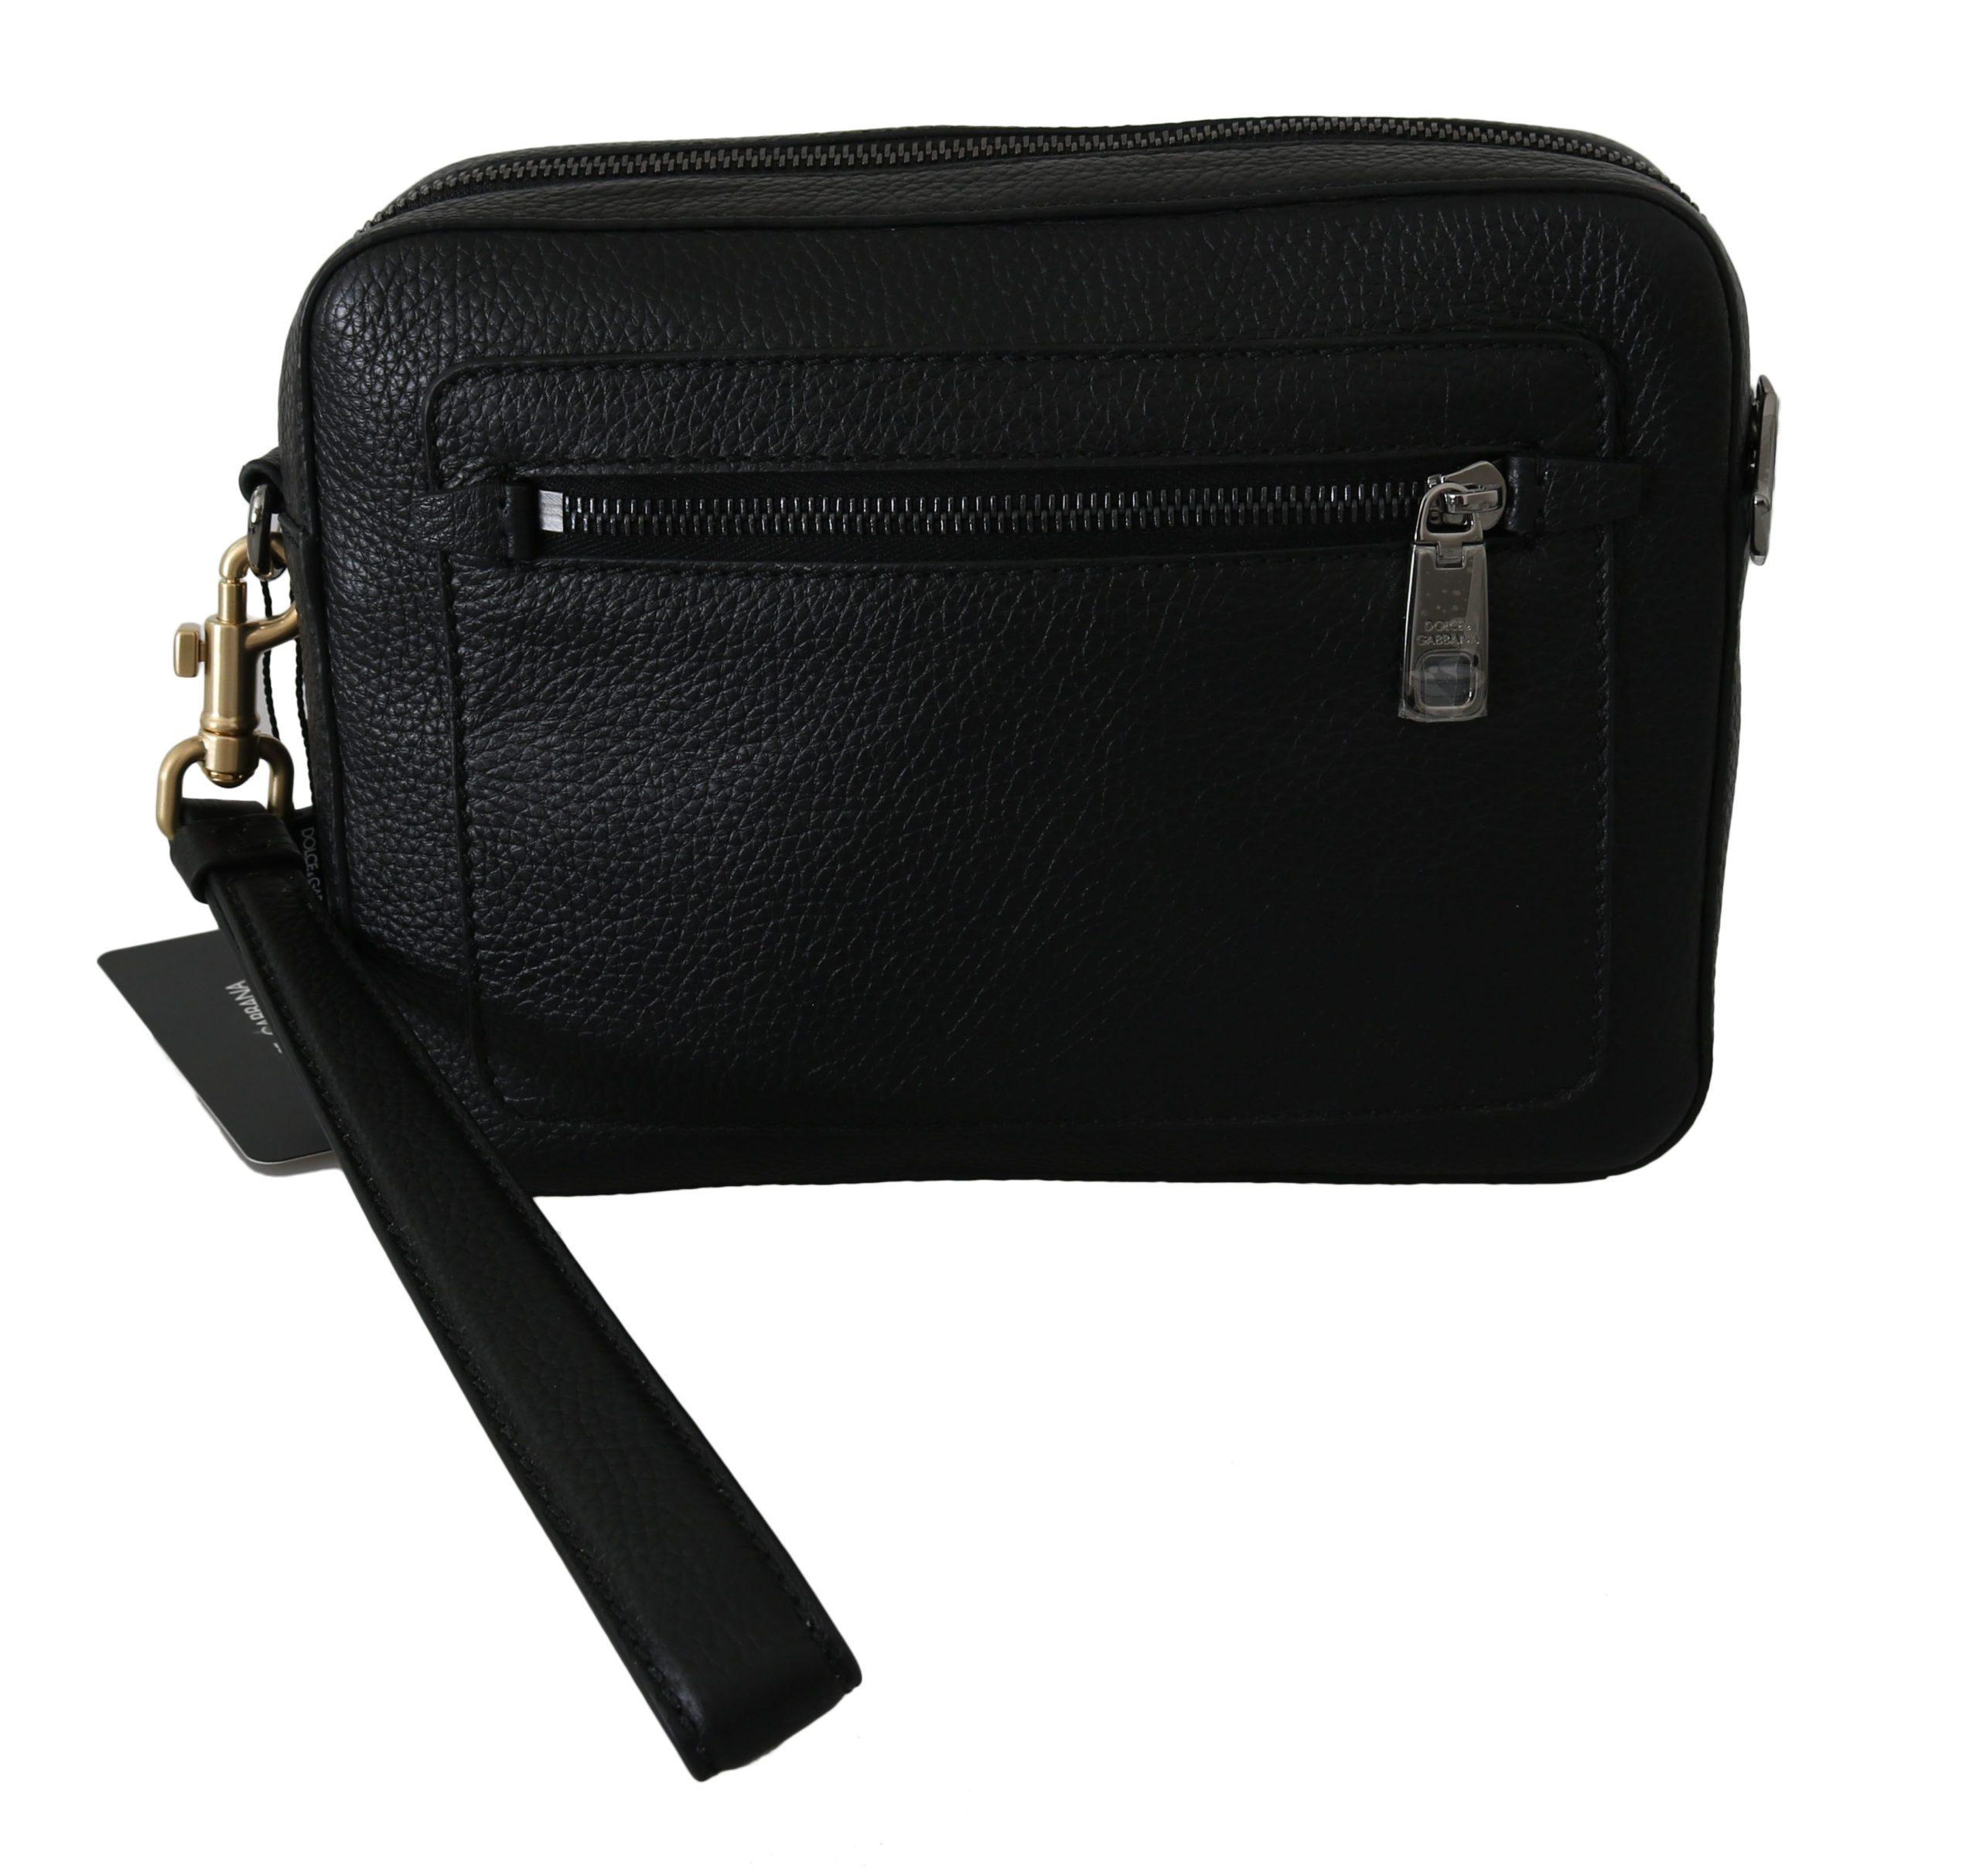 Dolce & Gabbana Men's Leather Wallet Black VAS8754